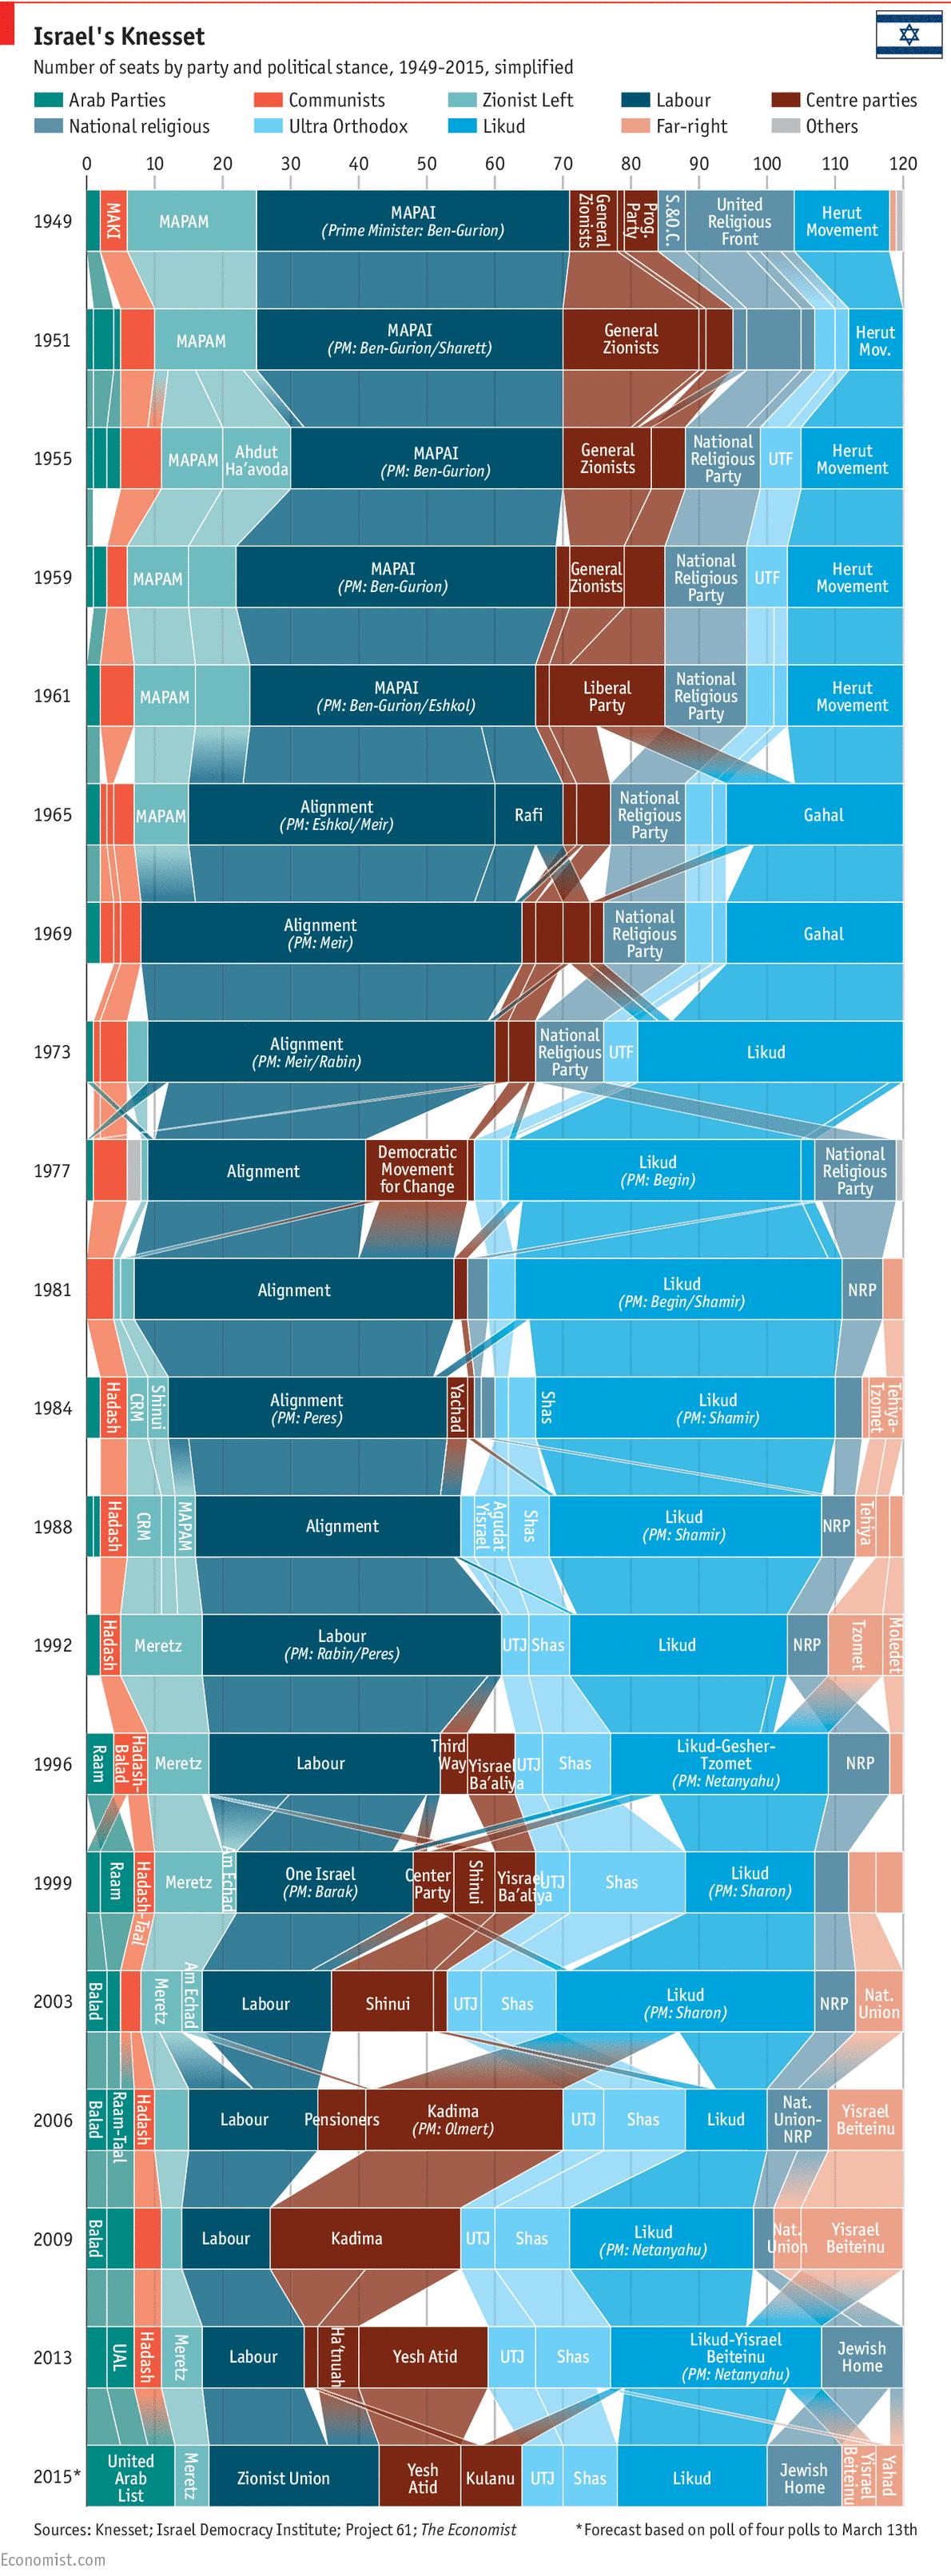 Evolución do voto nas eleccións israelís. http://www.economist.com/blogs/economist-explains/2015/03/economist-explains-11?fsrc=scn/fb/te/bl/ed/The_evolution_of_Israeli_politics